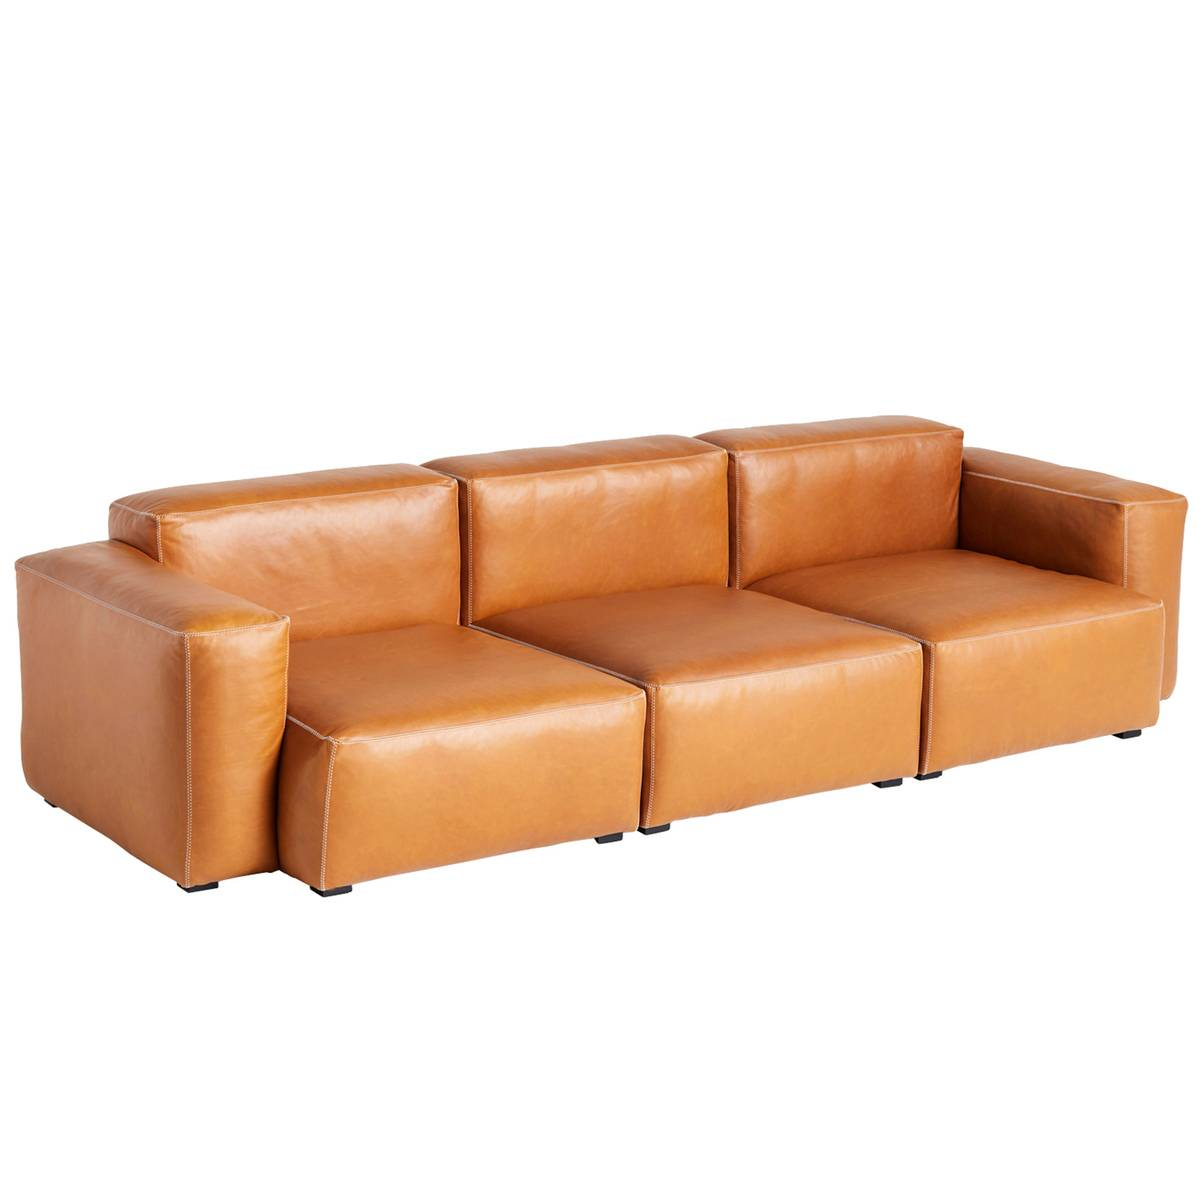 Hay Mags Soft sohva 3-ist/269 cm, matala käsinoja, Silk 0250